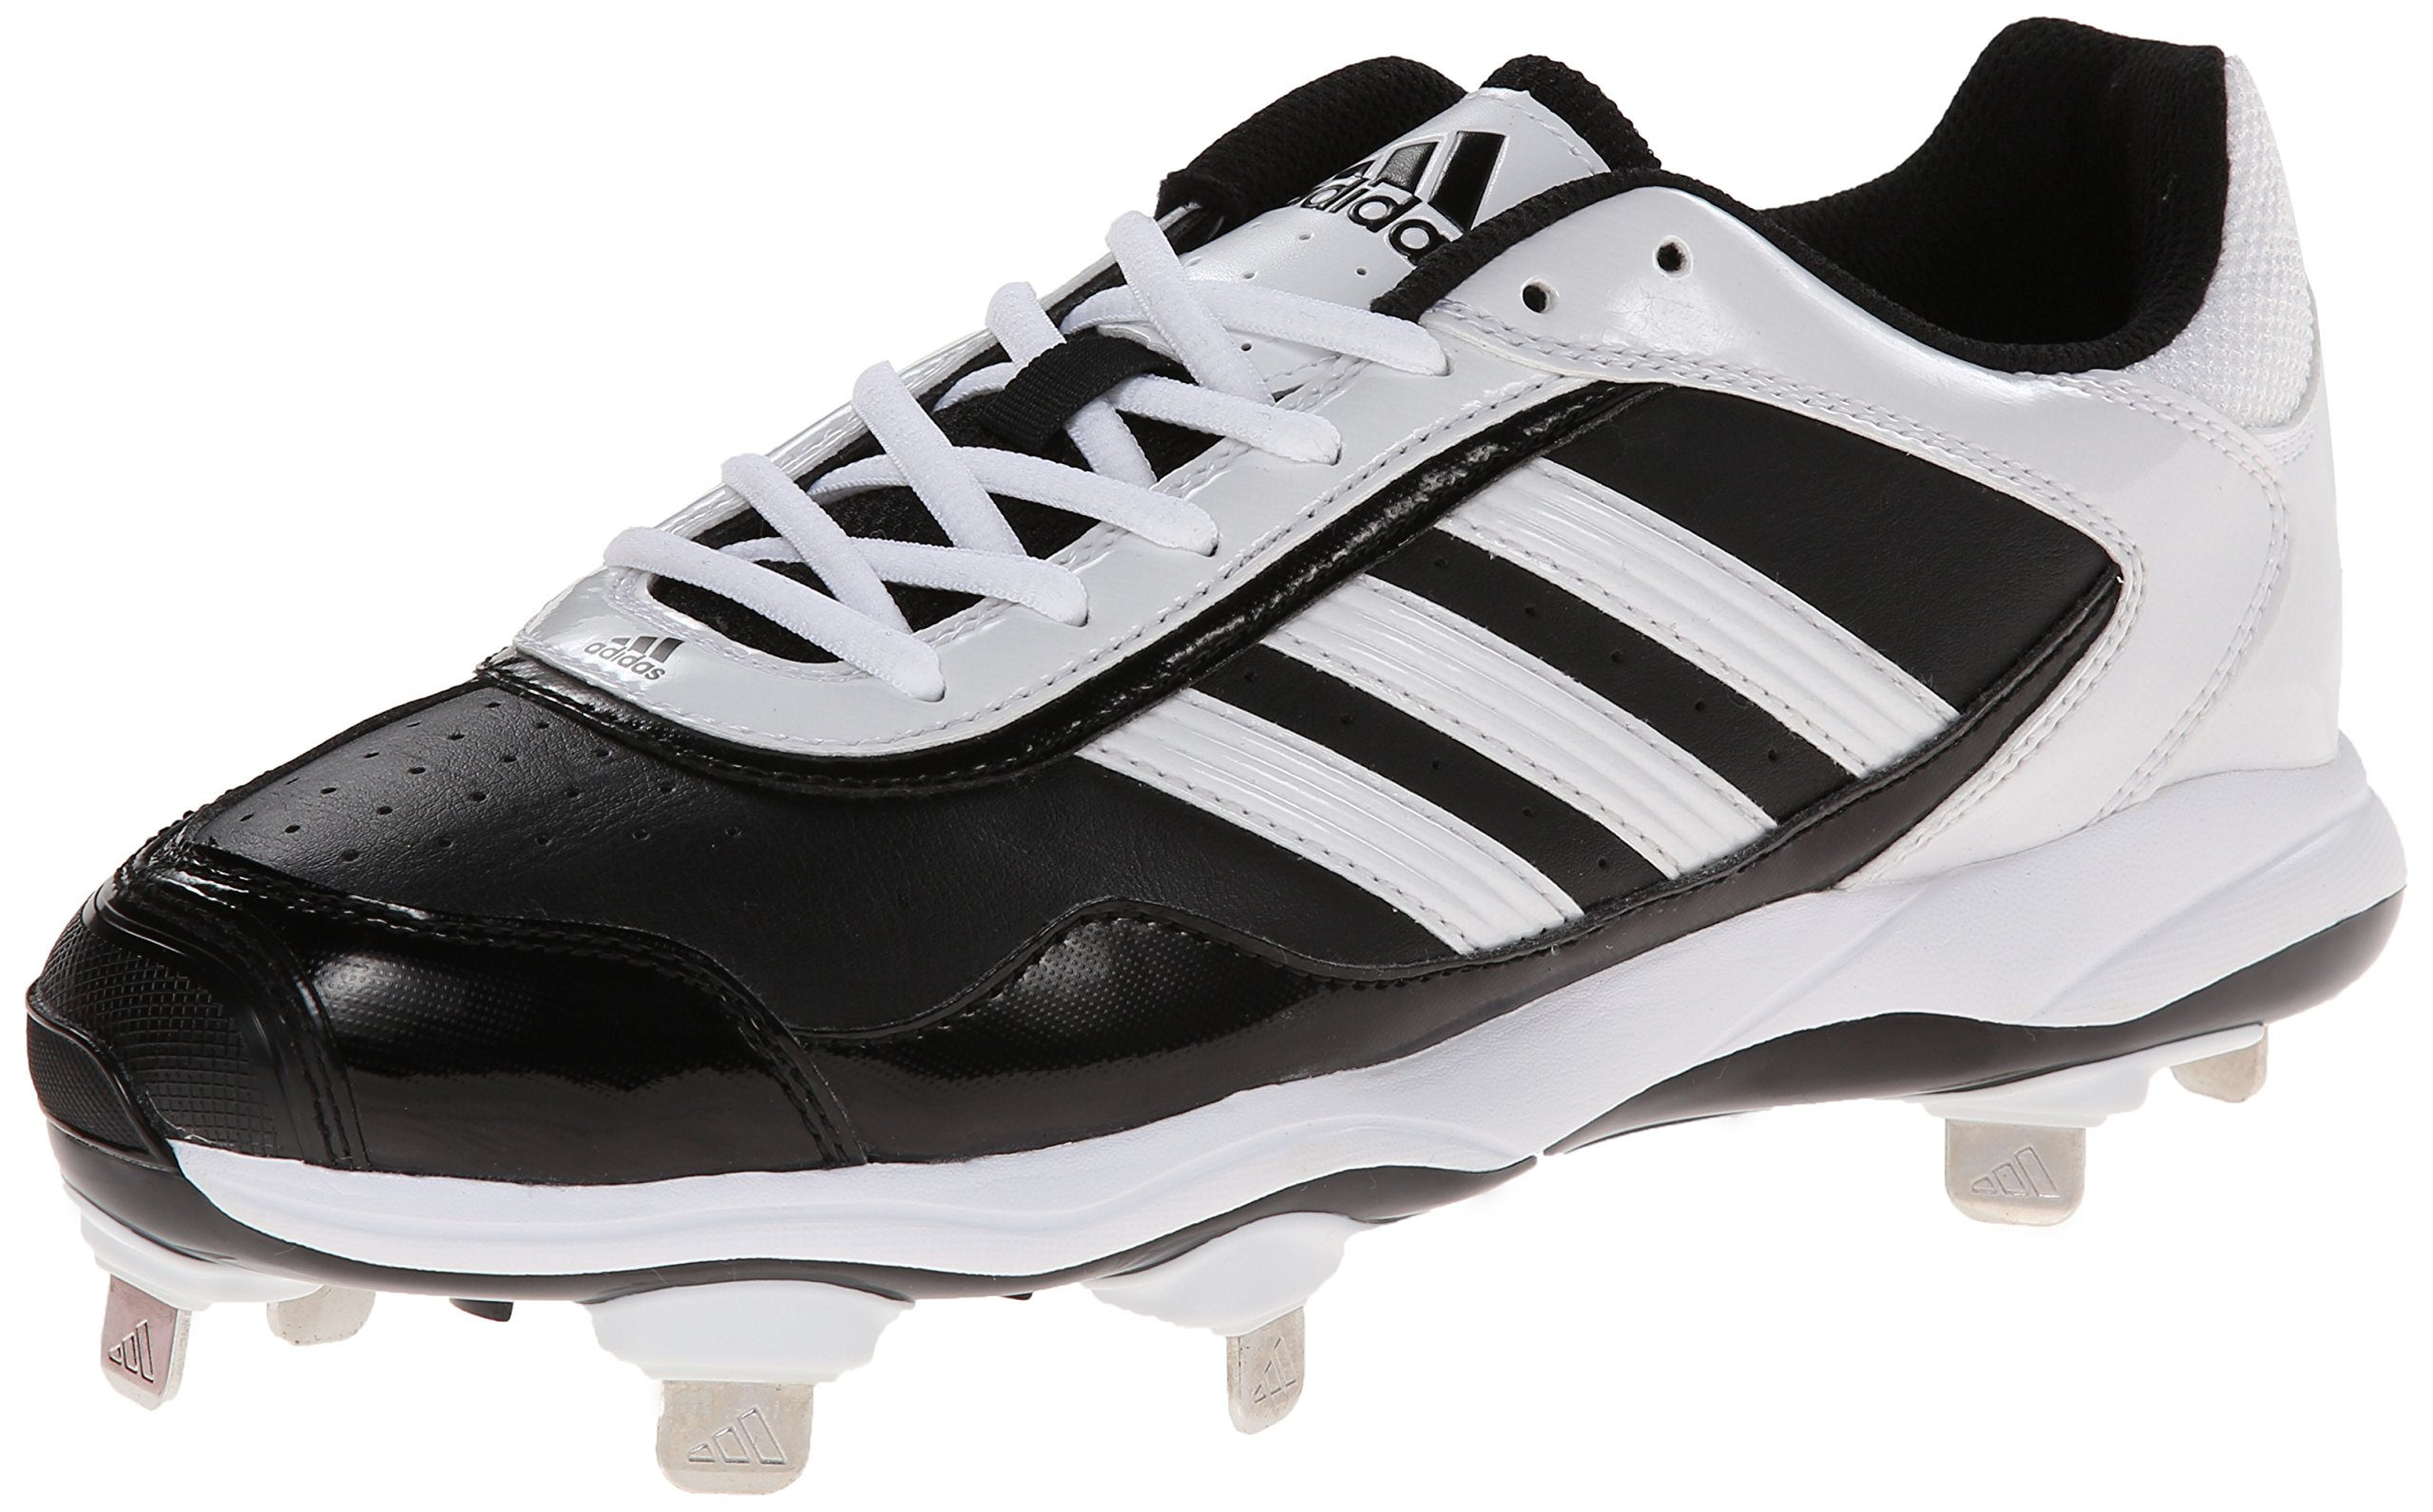 adidas Performance Women's Abbott Pro Metal 2 Softball Cleat, Core Black/Running White/Black 1, 8.5 M US